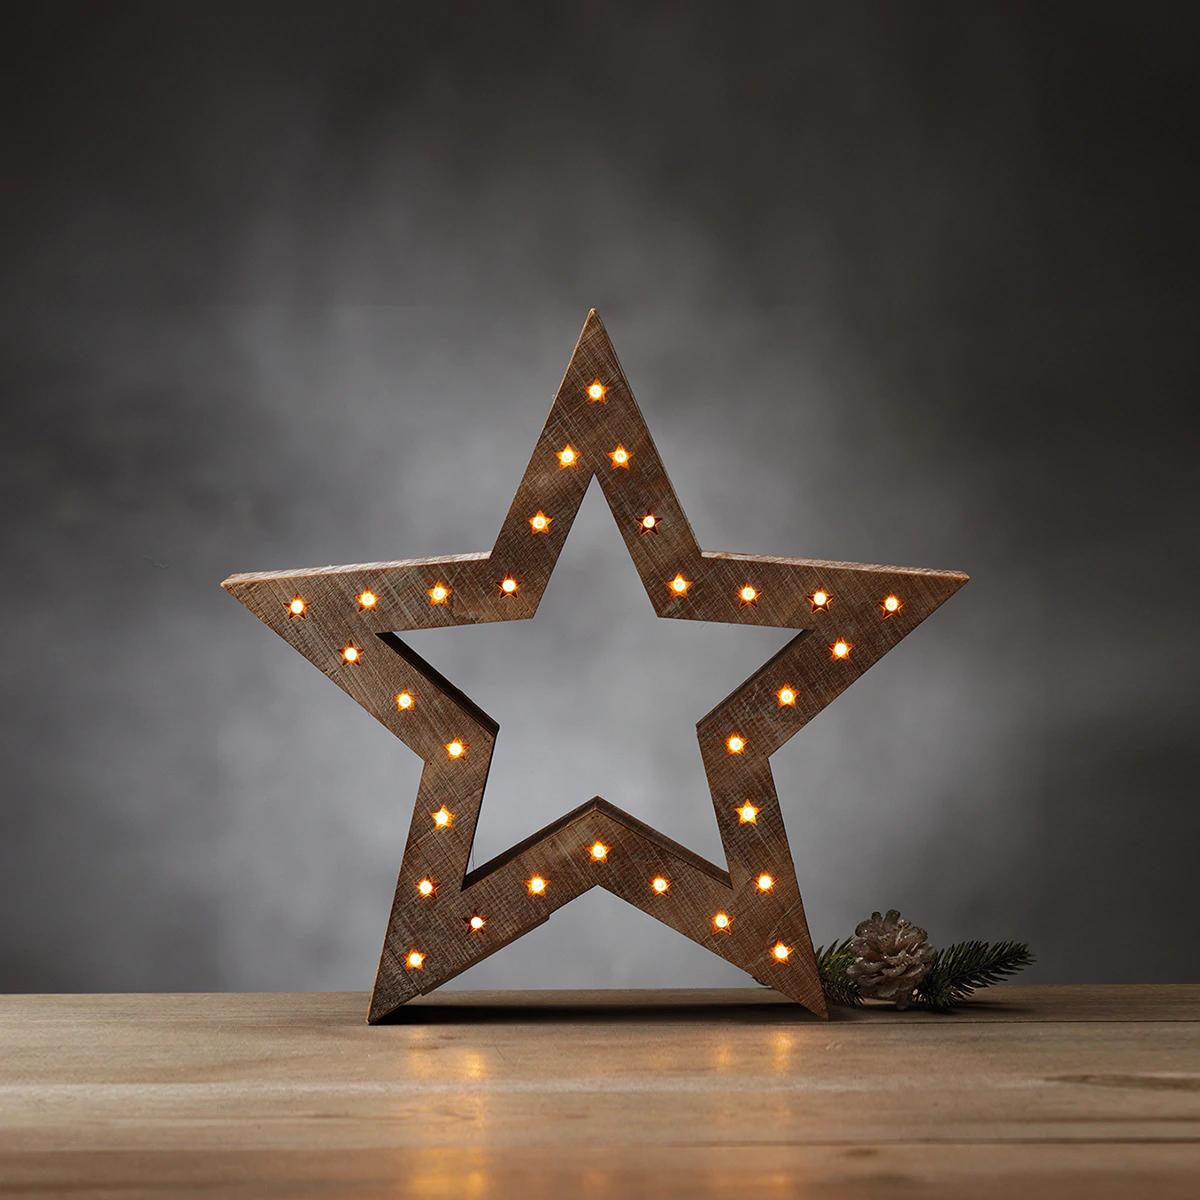 Estrella con luz